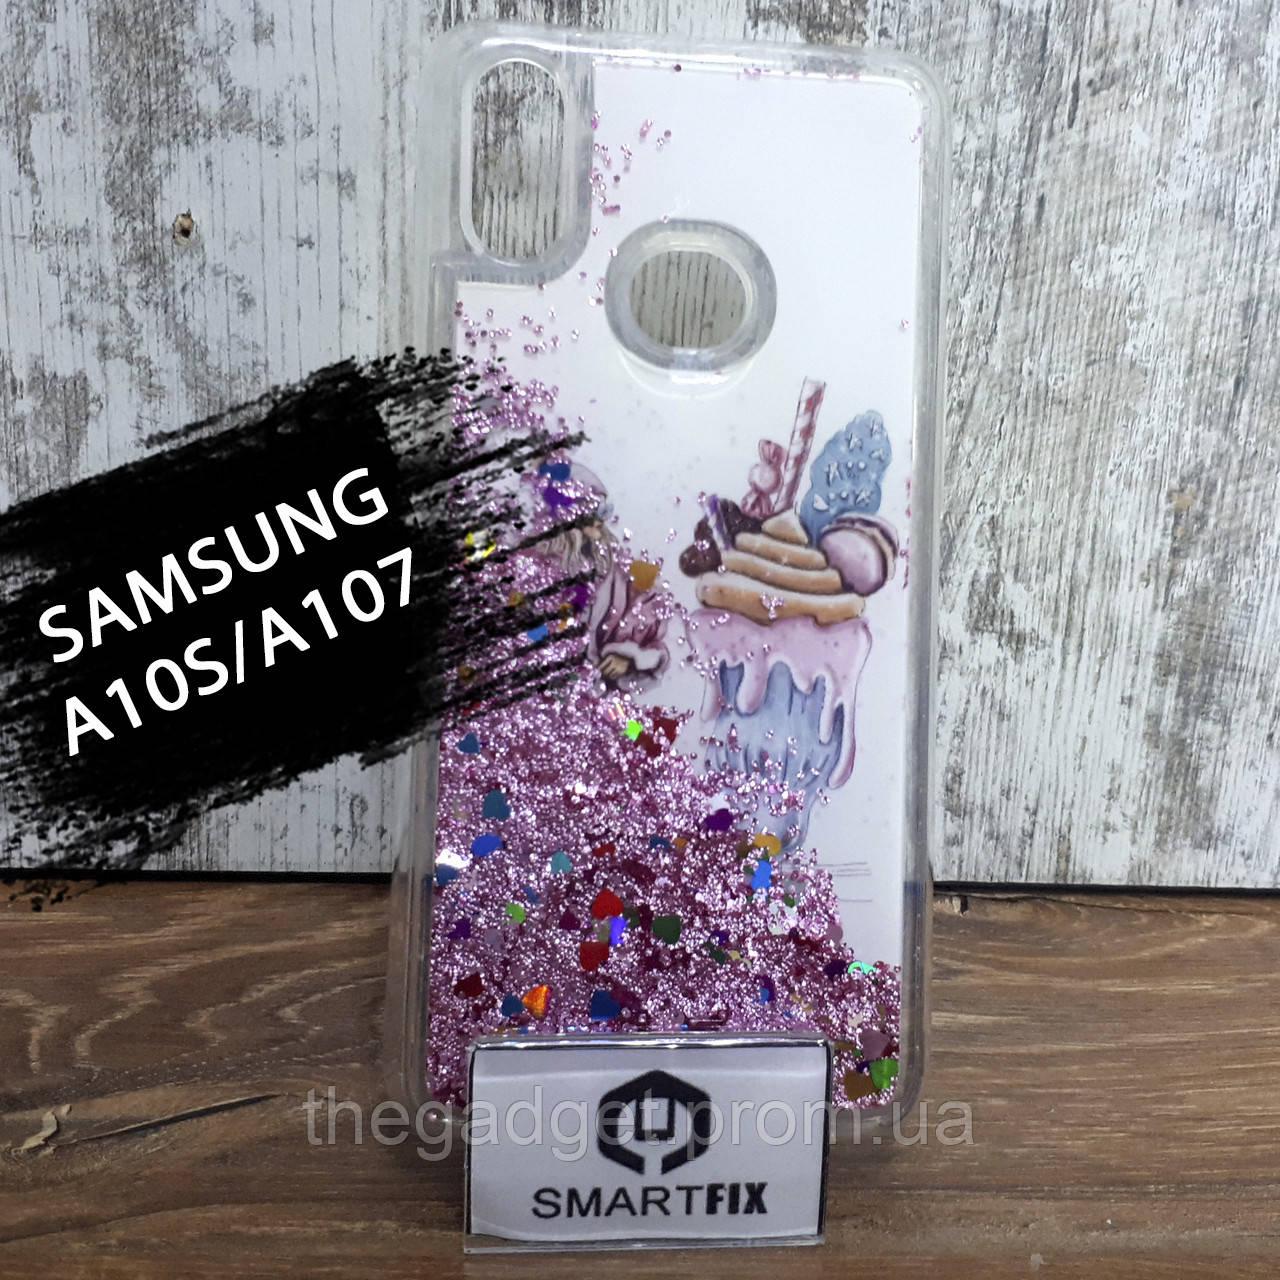 Переливающийся чехол с рисунком для Samsung A10S/A107